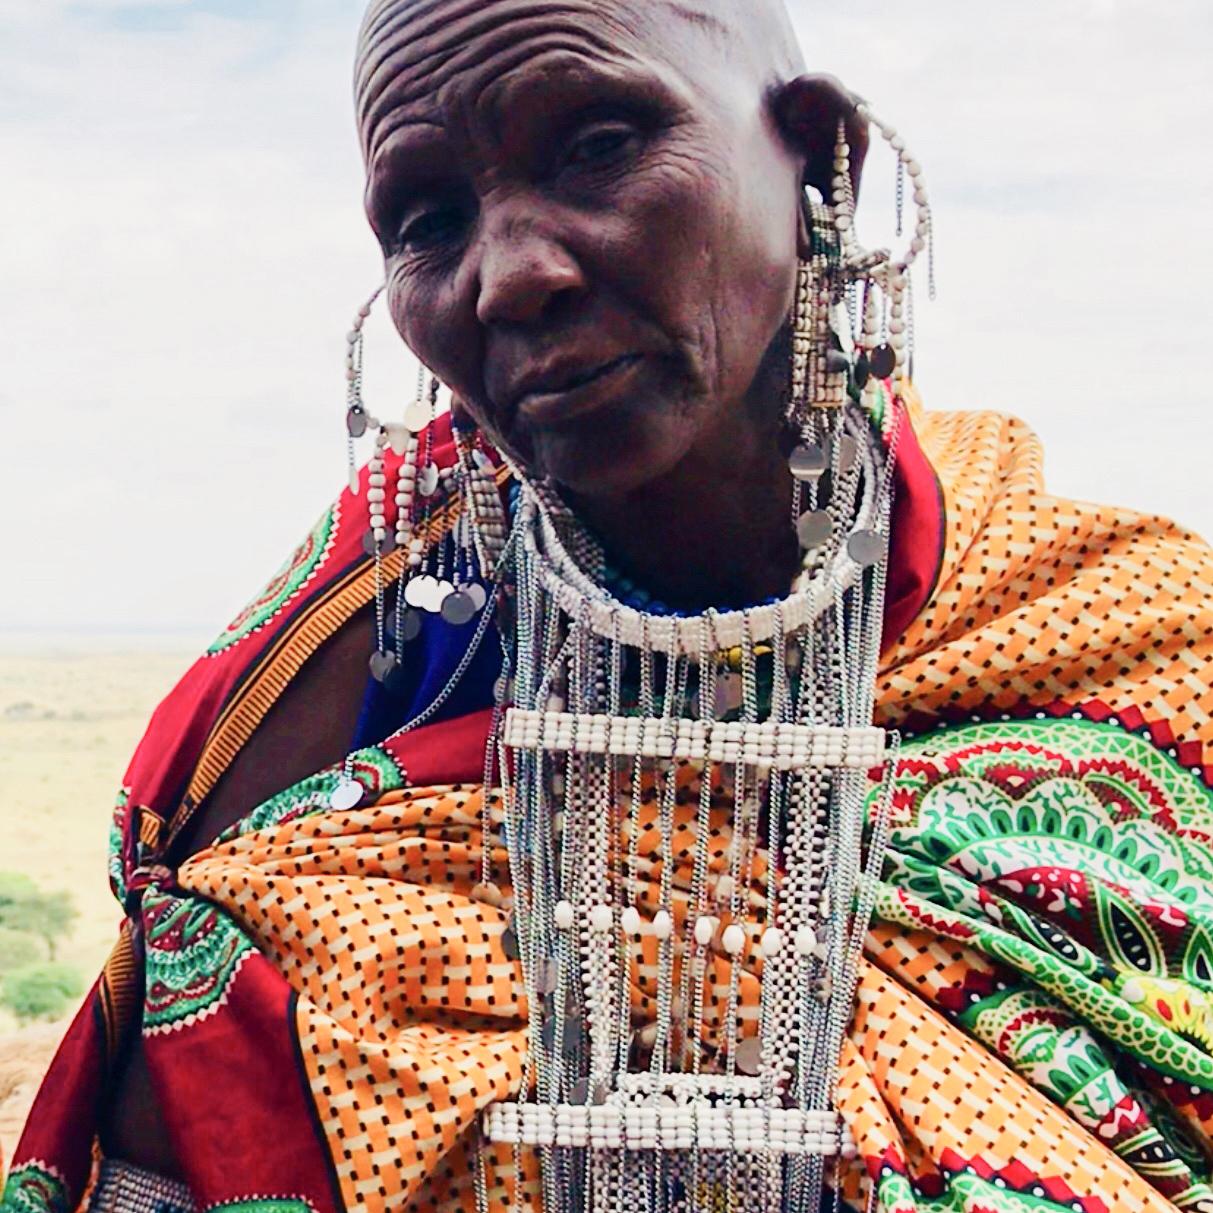 Salomé / Lekirumuni Village   Emusalaba necklace